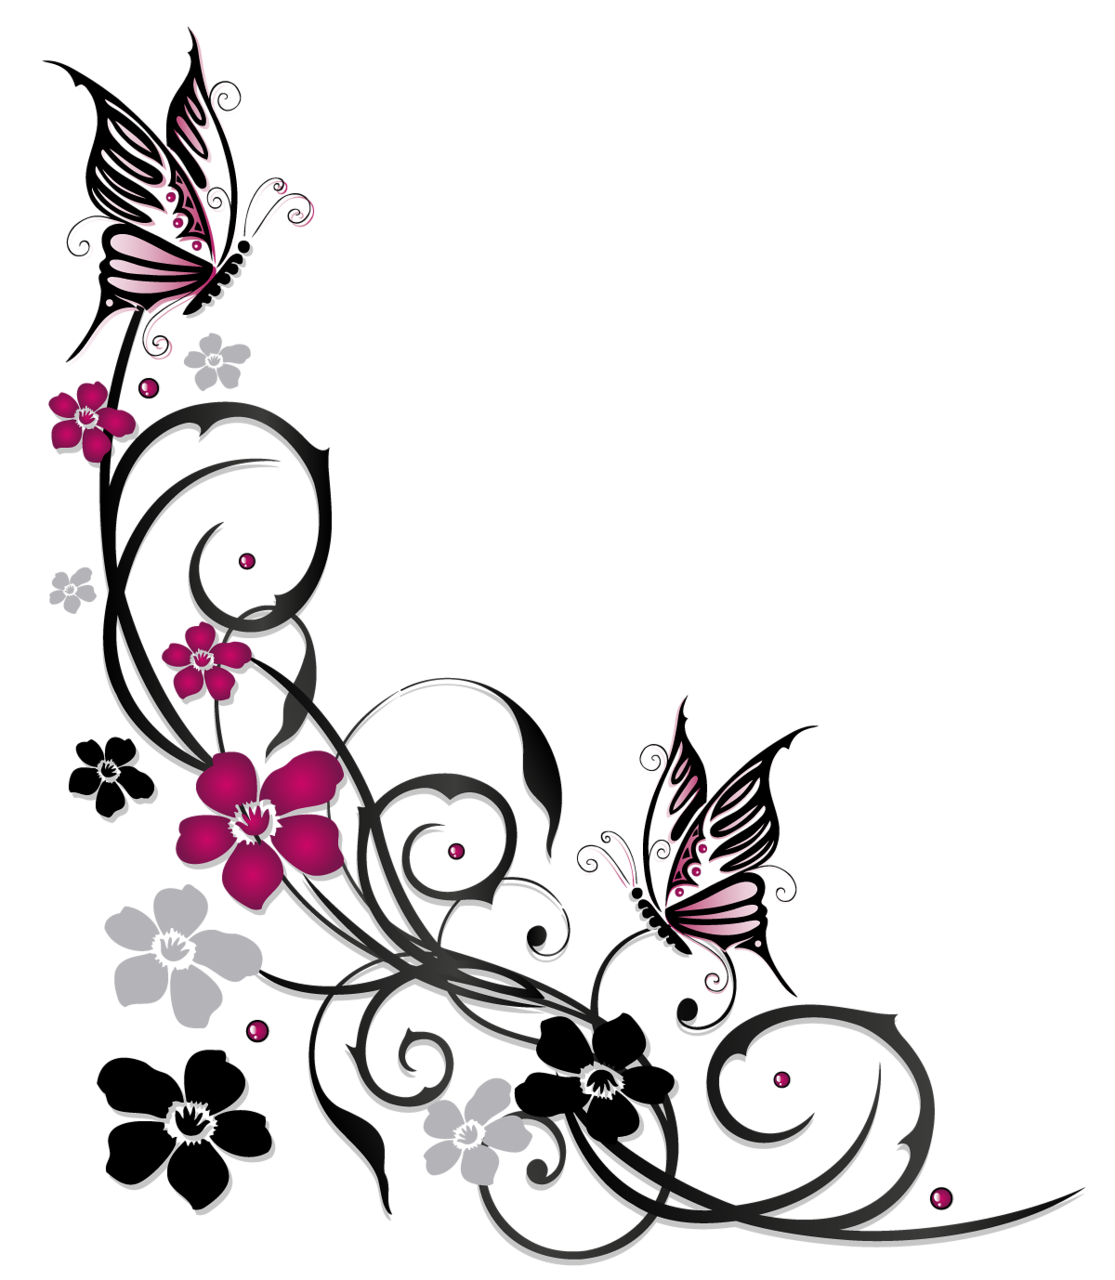 Butterfly 372 | Рамки | Тату, Татуировки, Рисунки